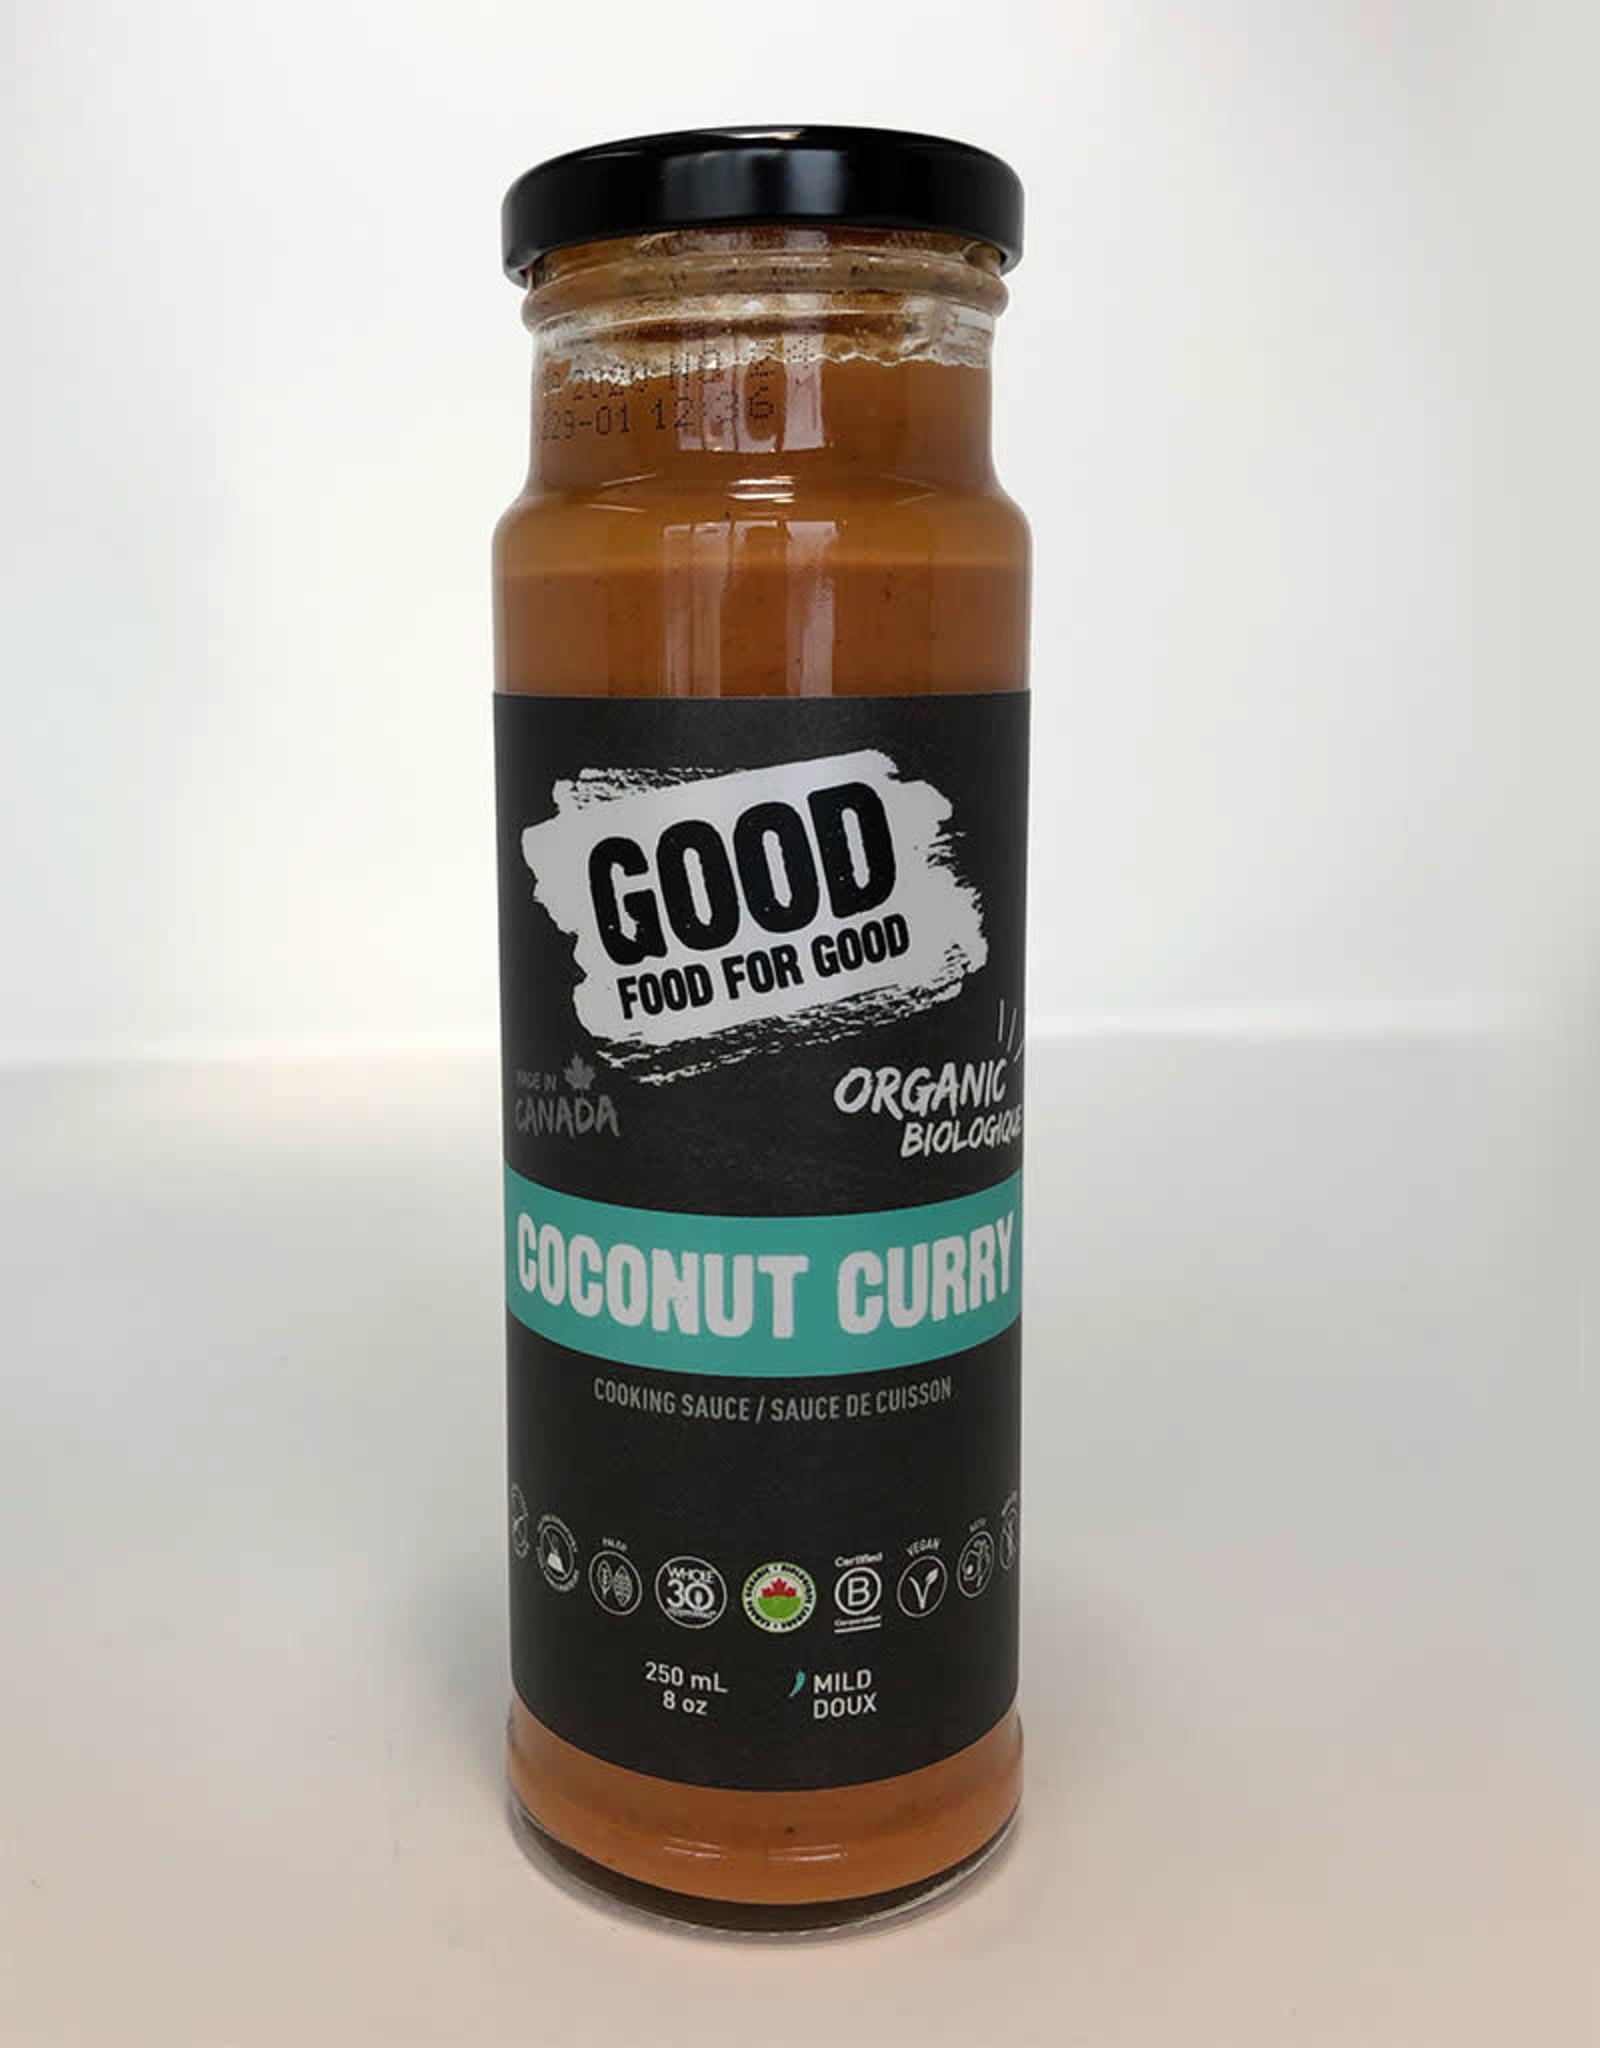 Good Food For Good Good Food For Good - Sauce, Coconut Curry Bio (250ml)